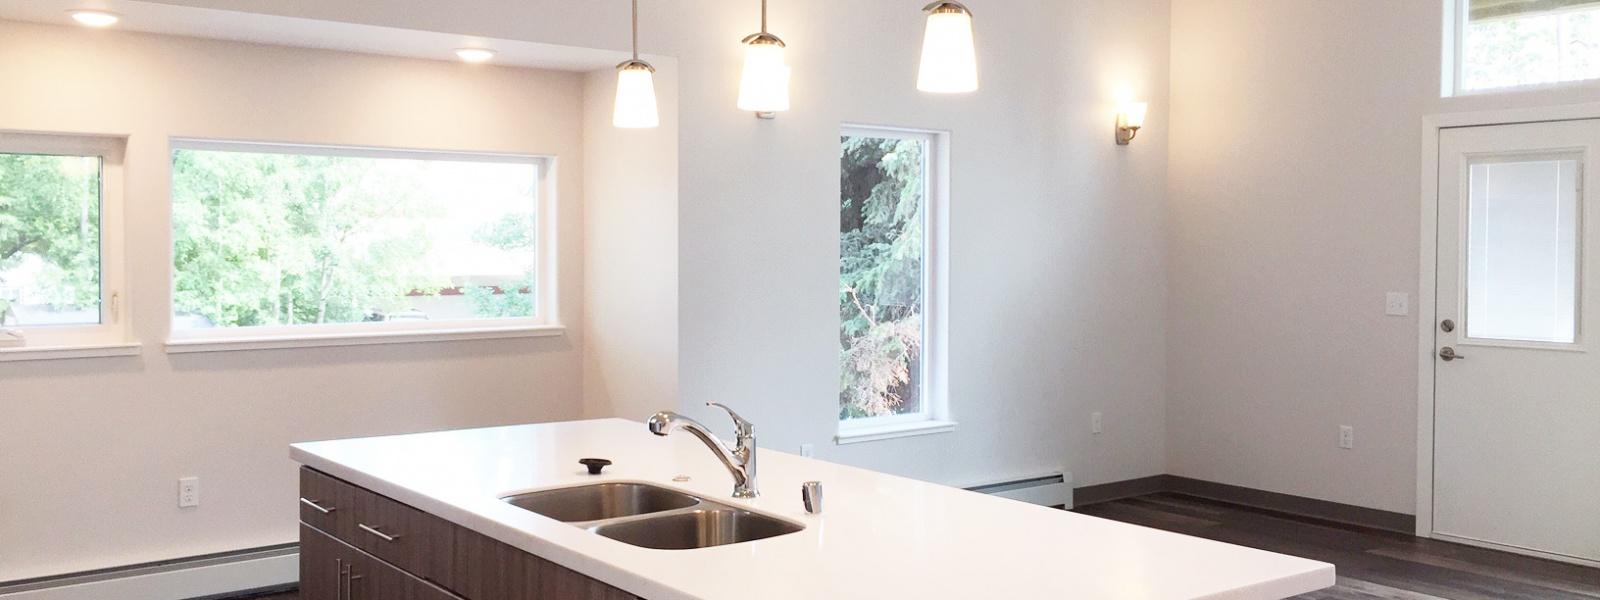 3602 Oregon, Anchorage, 99503, 2 Bedrooms Bedrooms, ,1 BathroomBathrooms,Apartment,For Rent,Oregon,1080